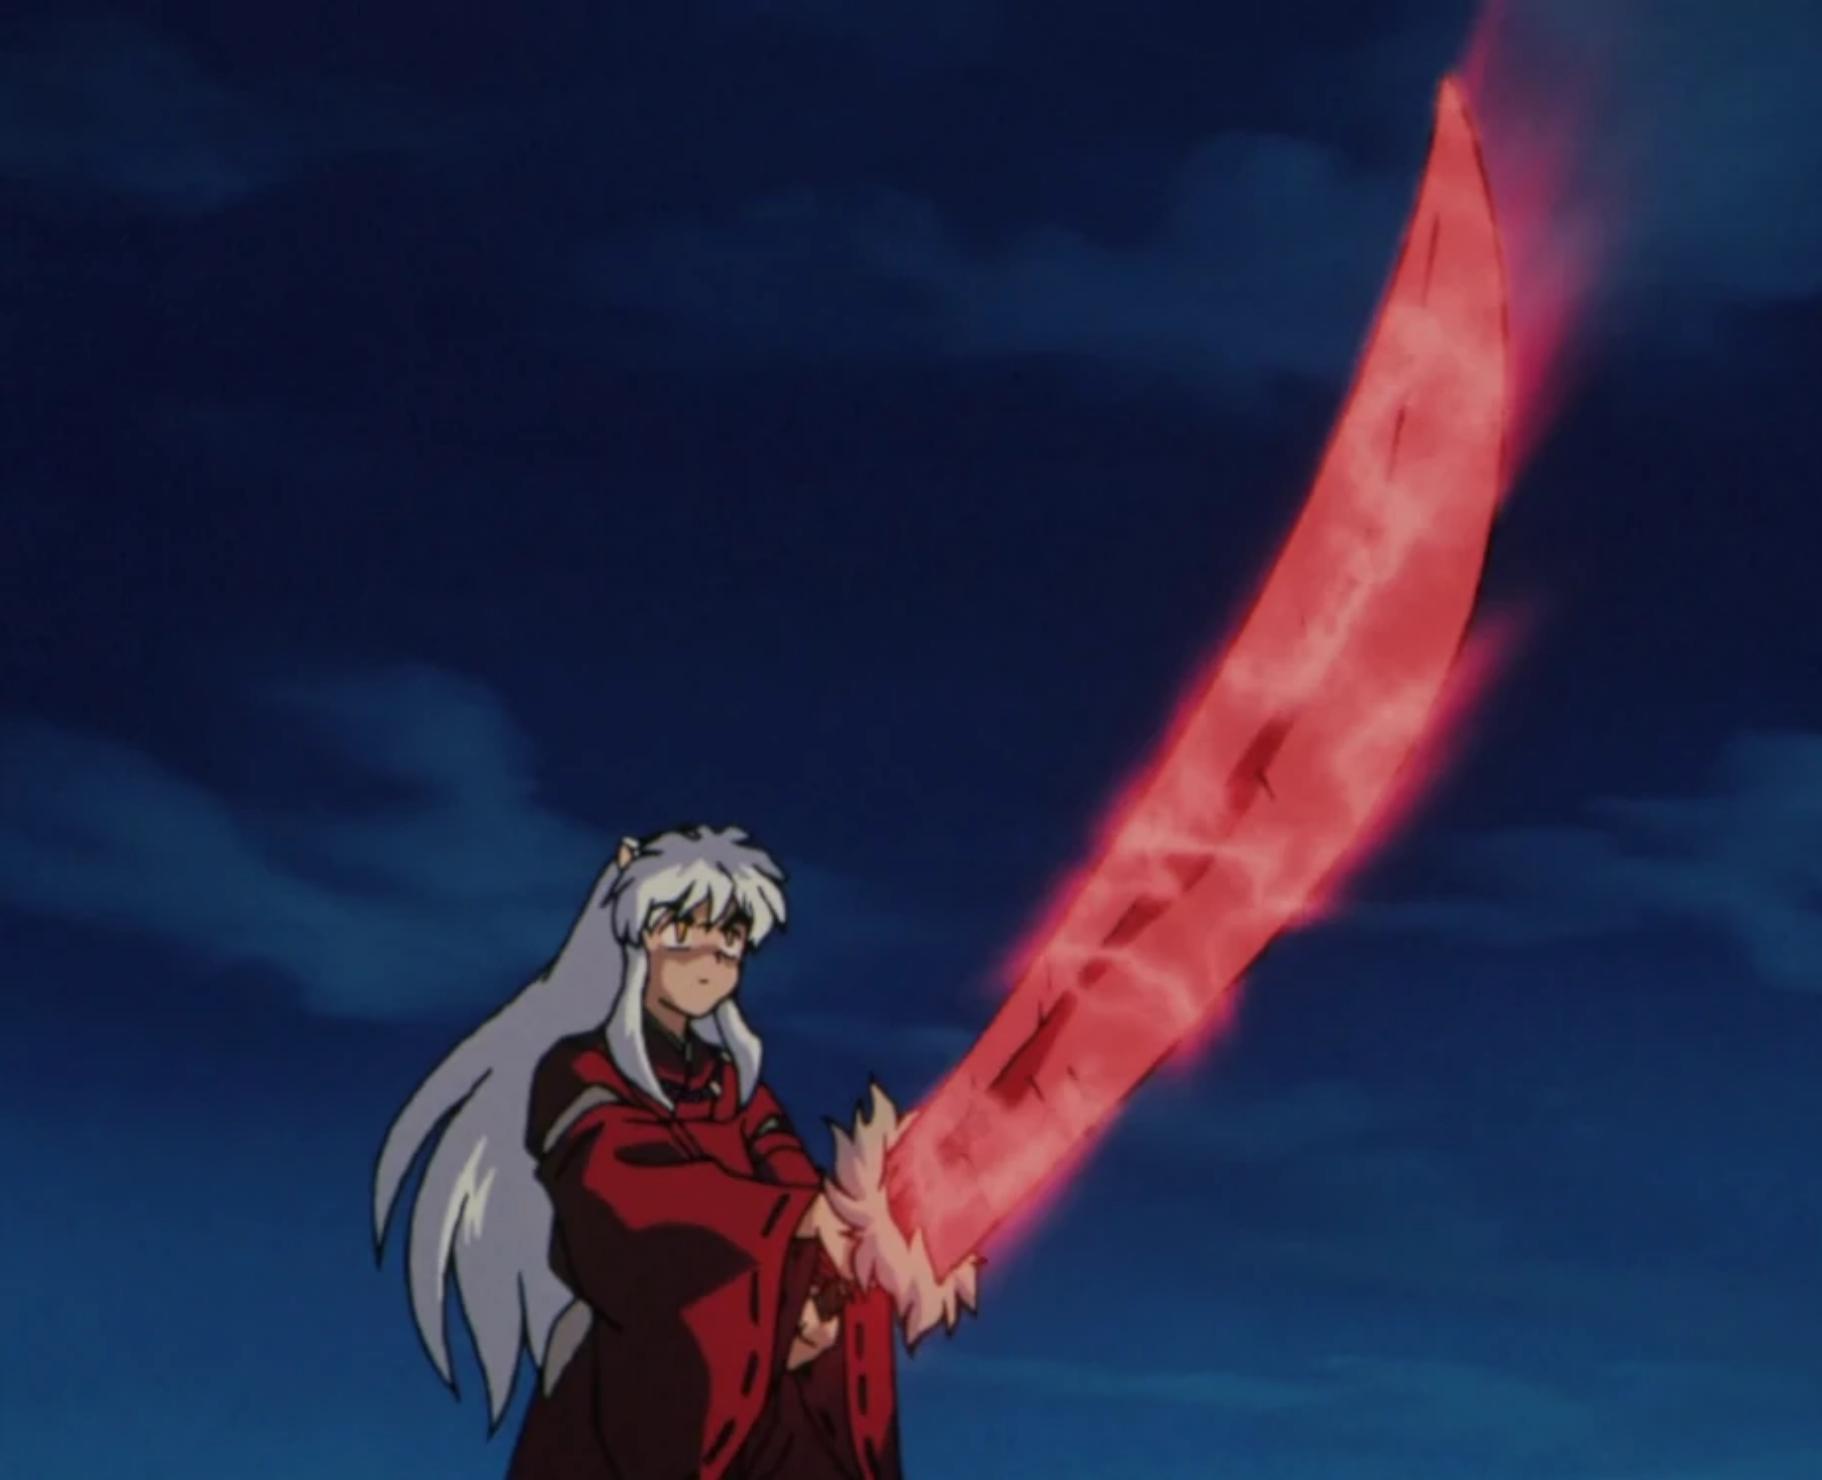 Inuyasha holding the red Tessiaga